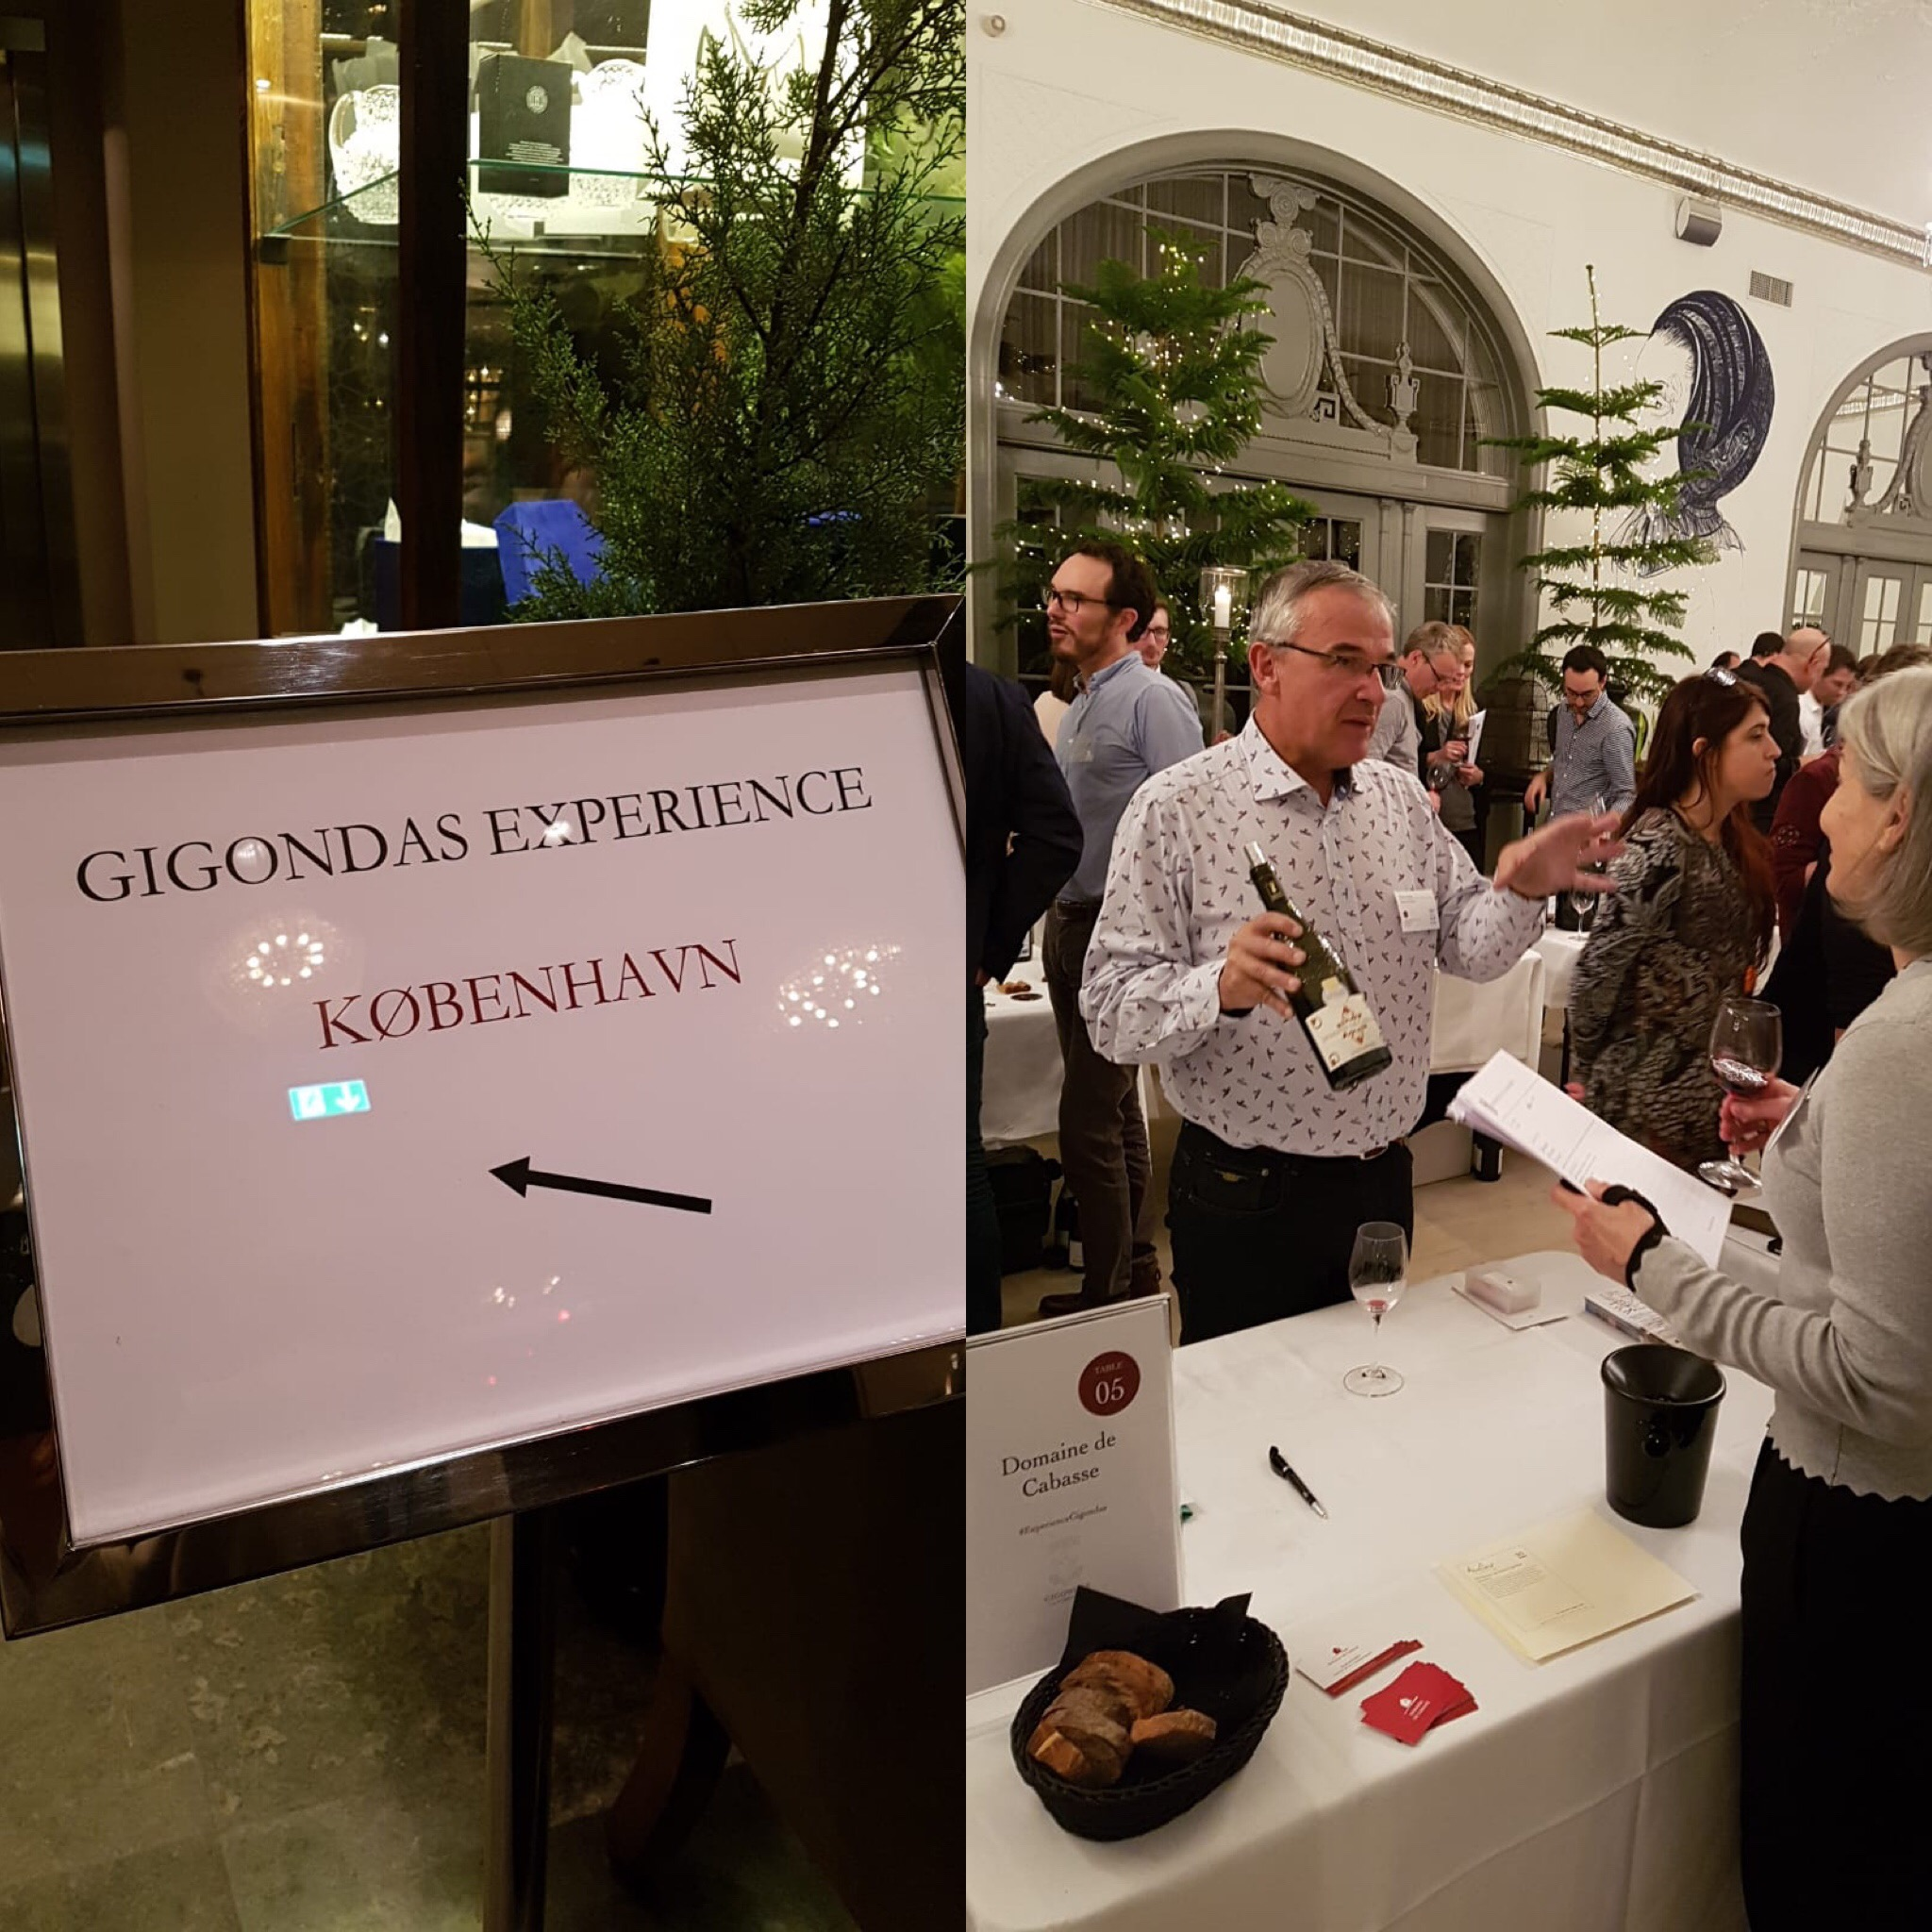 Prestigious operation of the Gigondas appellation in Copenhagen  #Wine